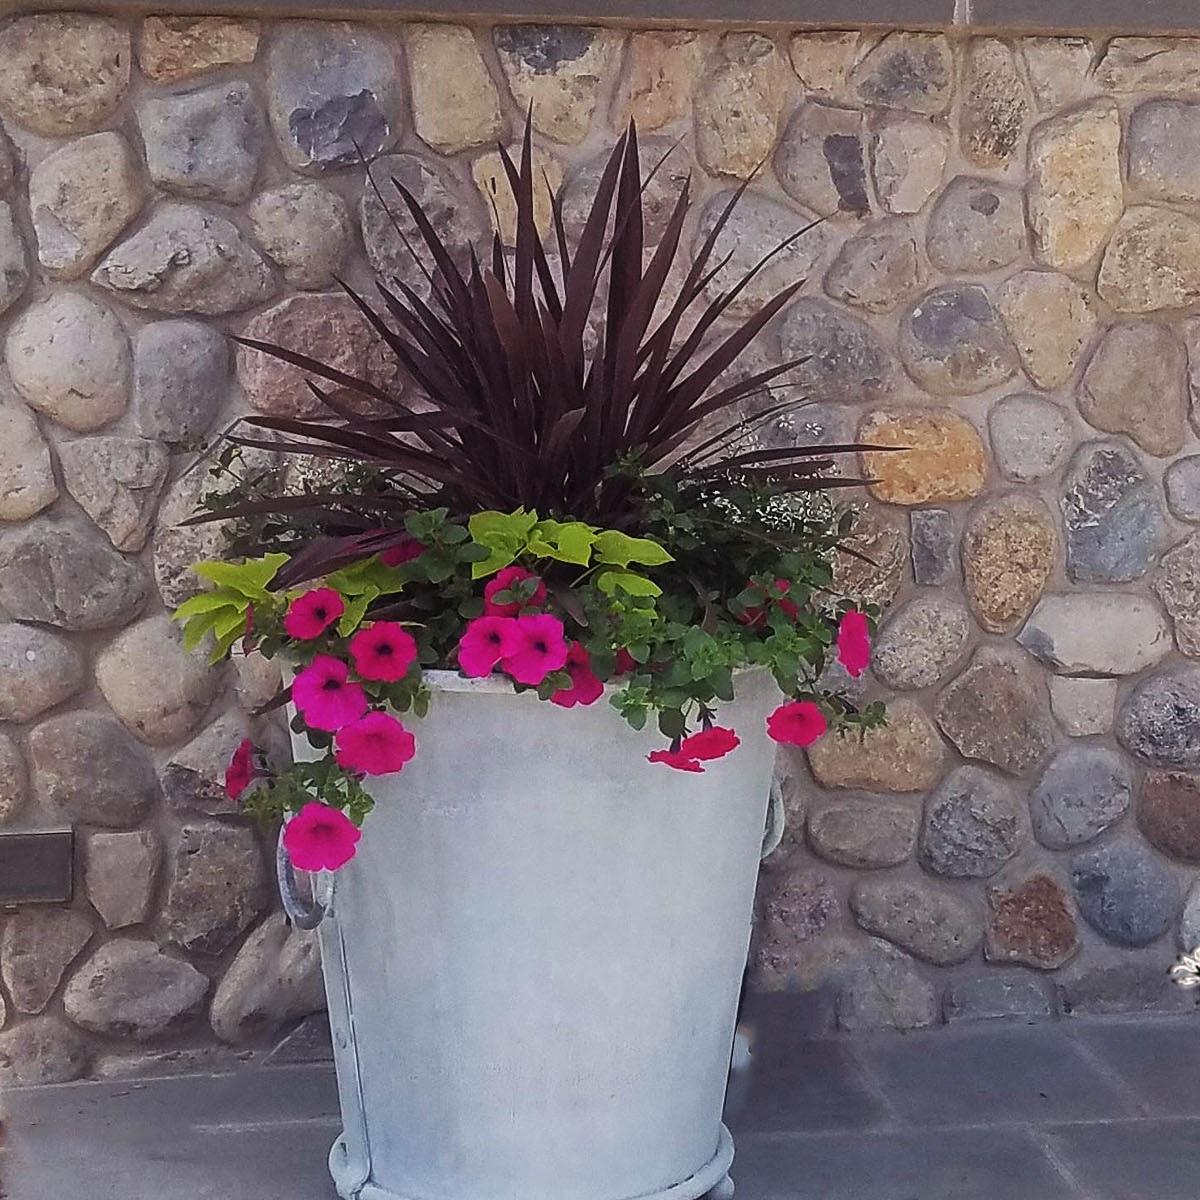 Garden Beds & Horticultural Care